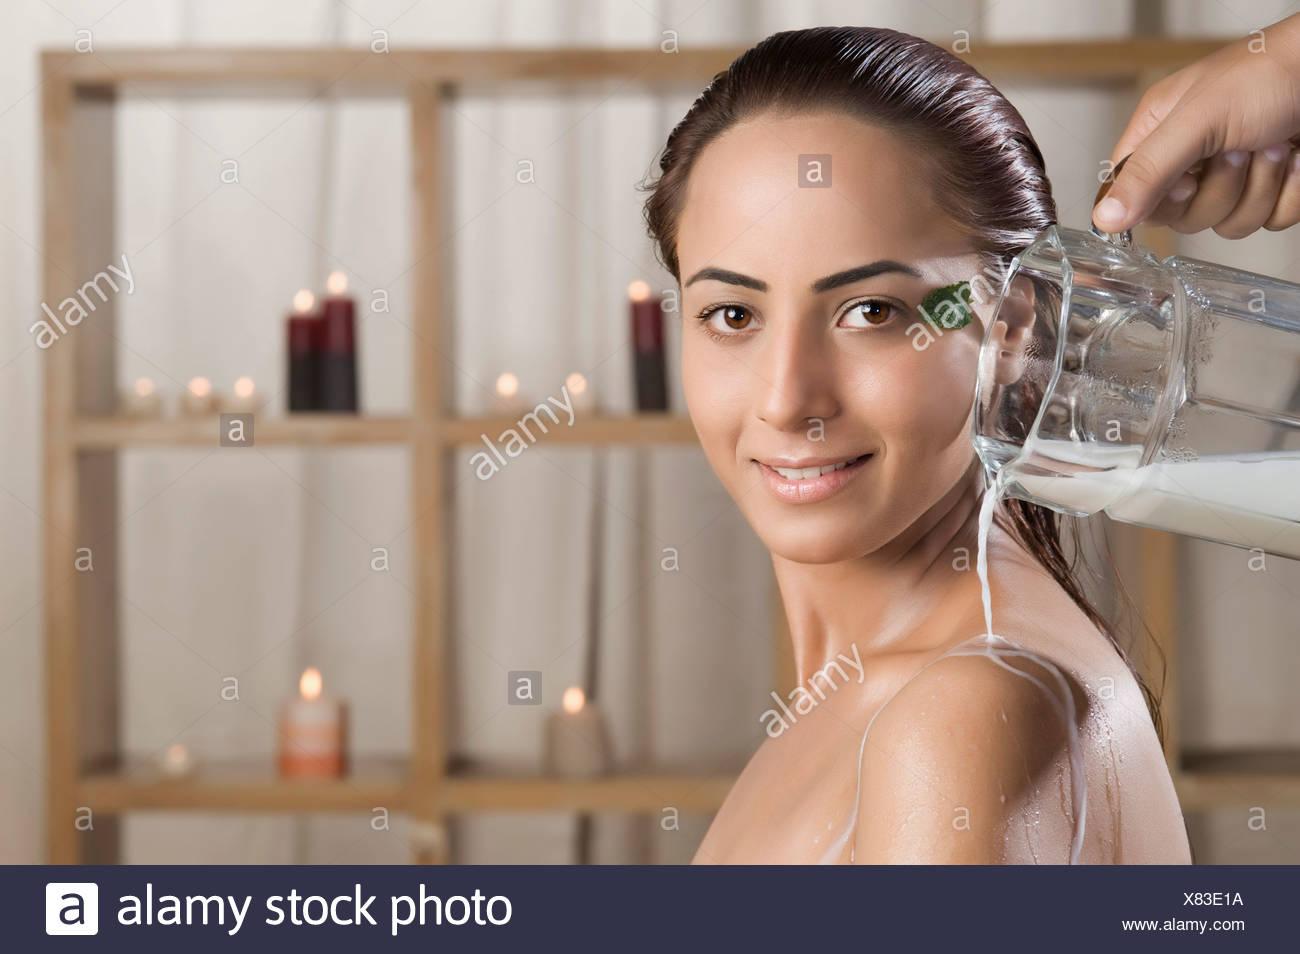 Woman taking a milk bath in a health spa Stock Photo: 280360006 - Alamy